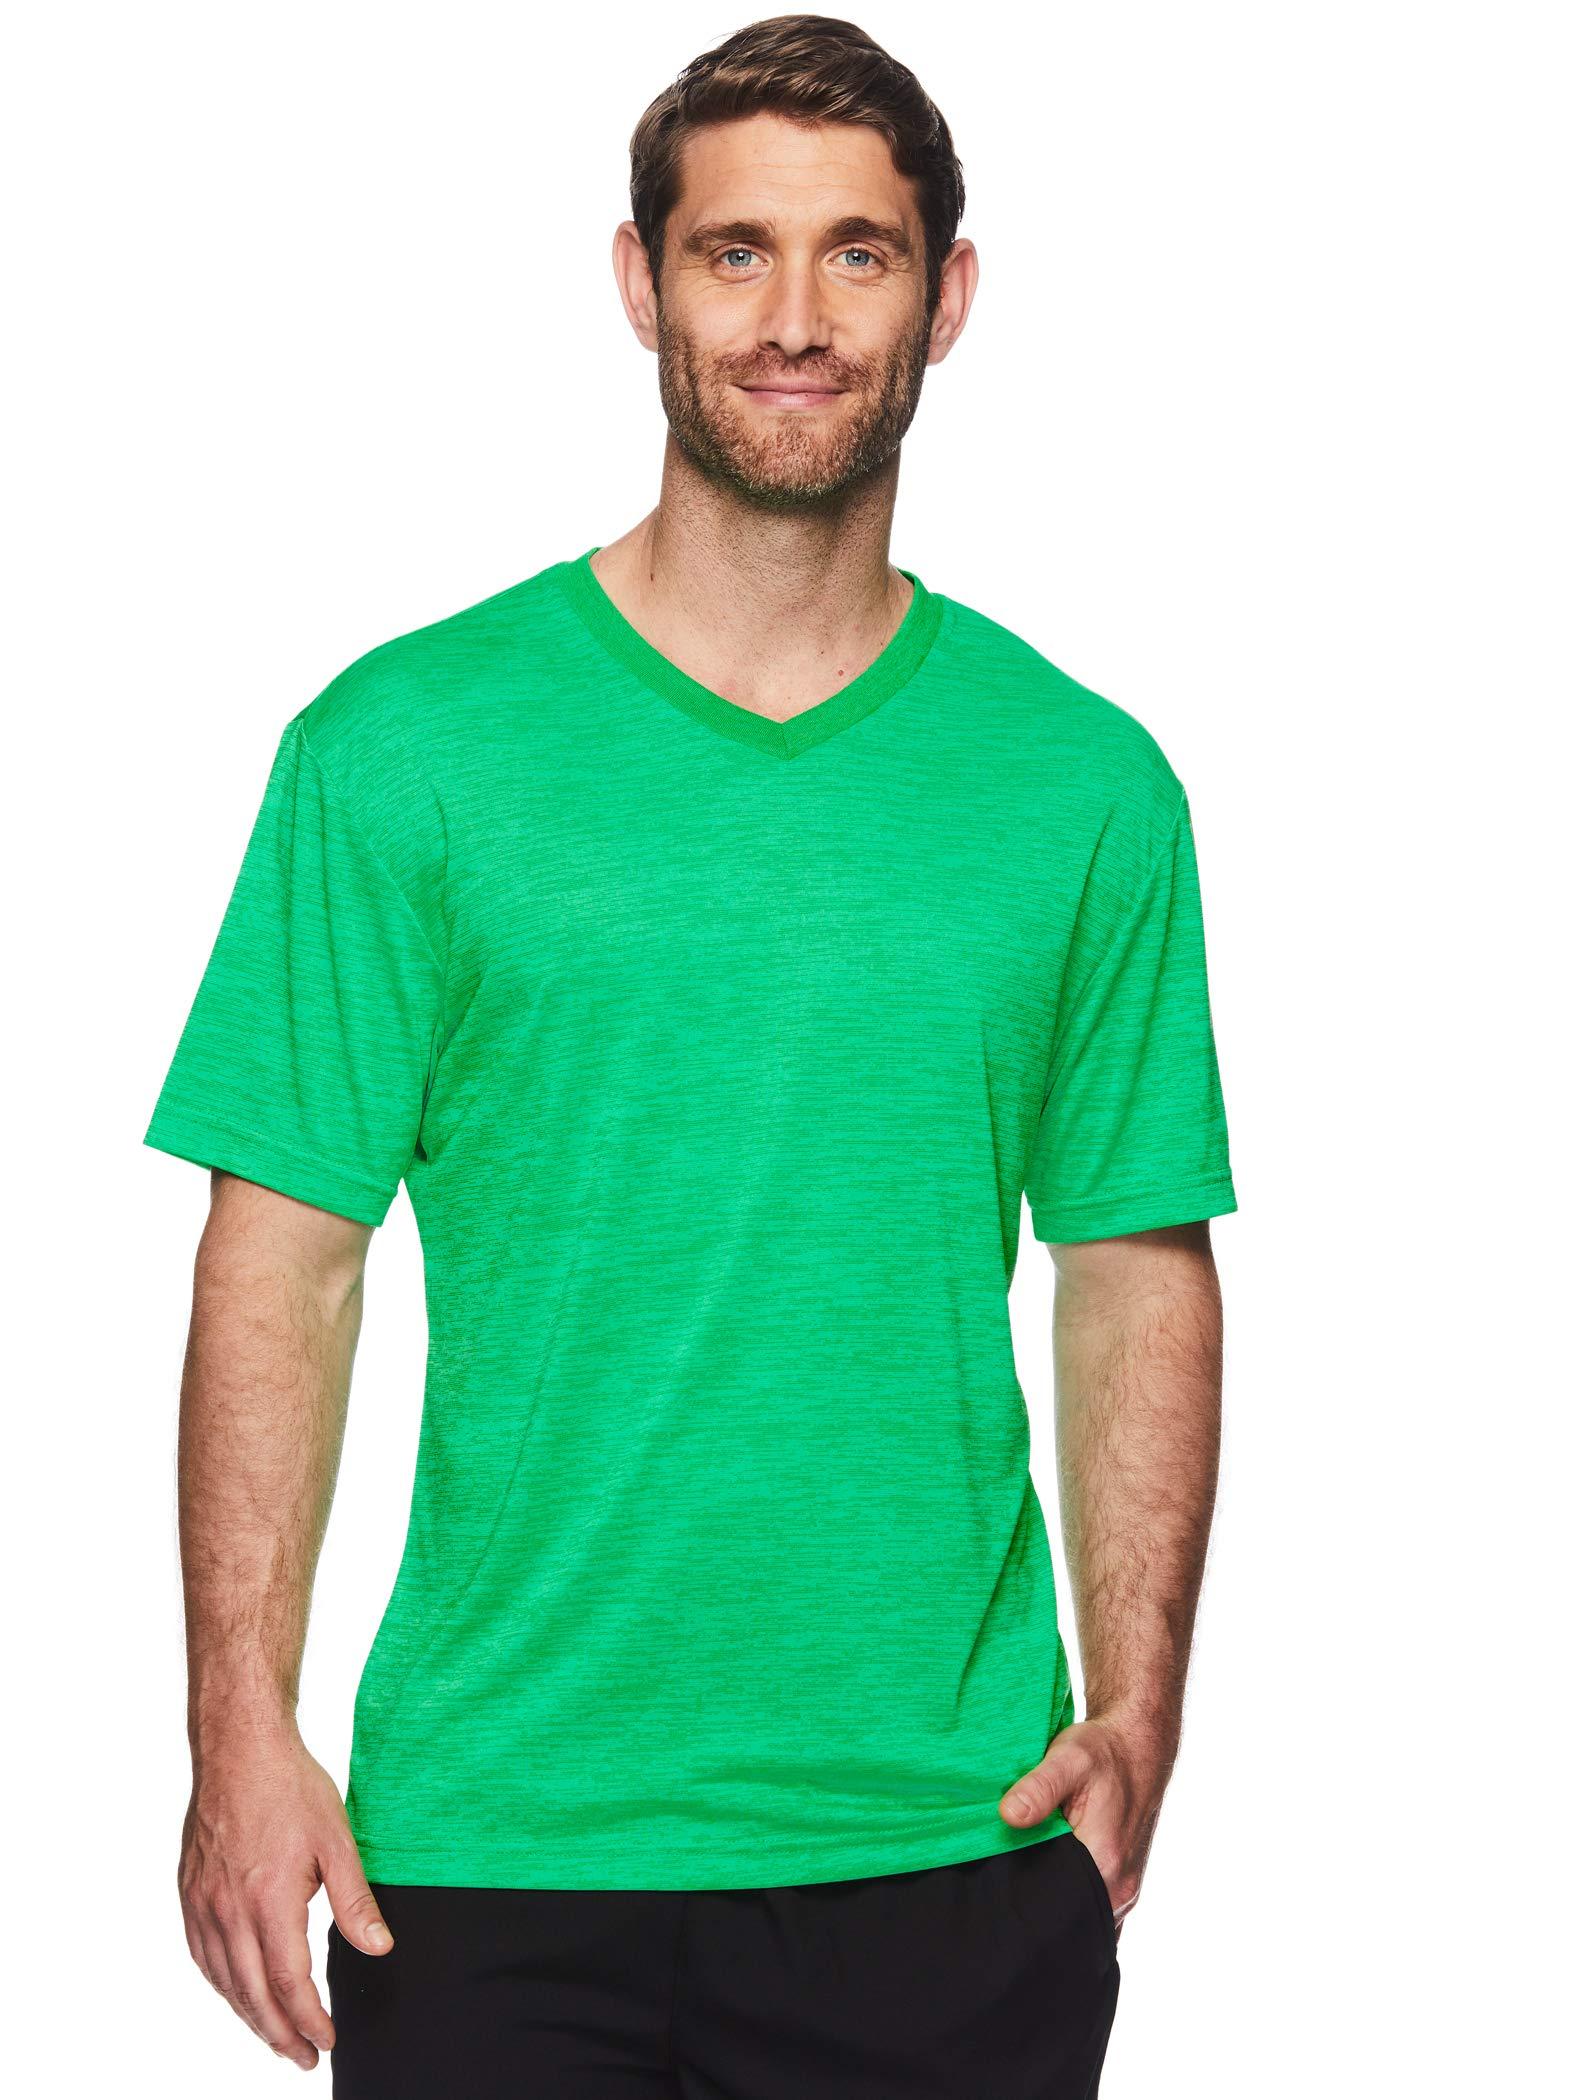 HEAD Men's V Neck Gym Training & Workout T-Shirt - Short Sleeve Activewear Top - Flash Andean Toucan Green Heather, Medium